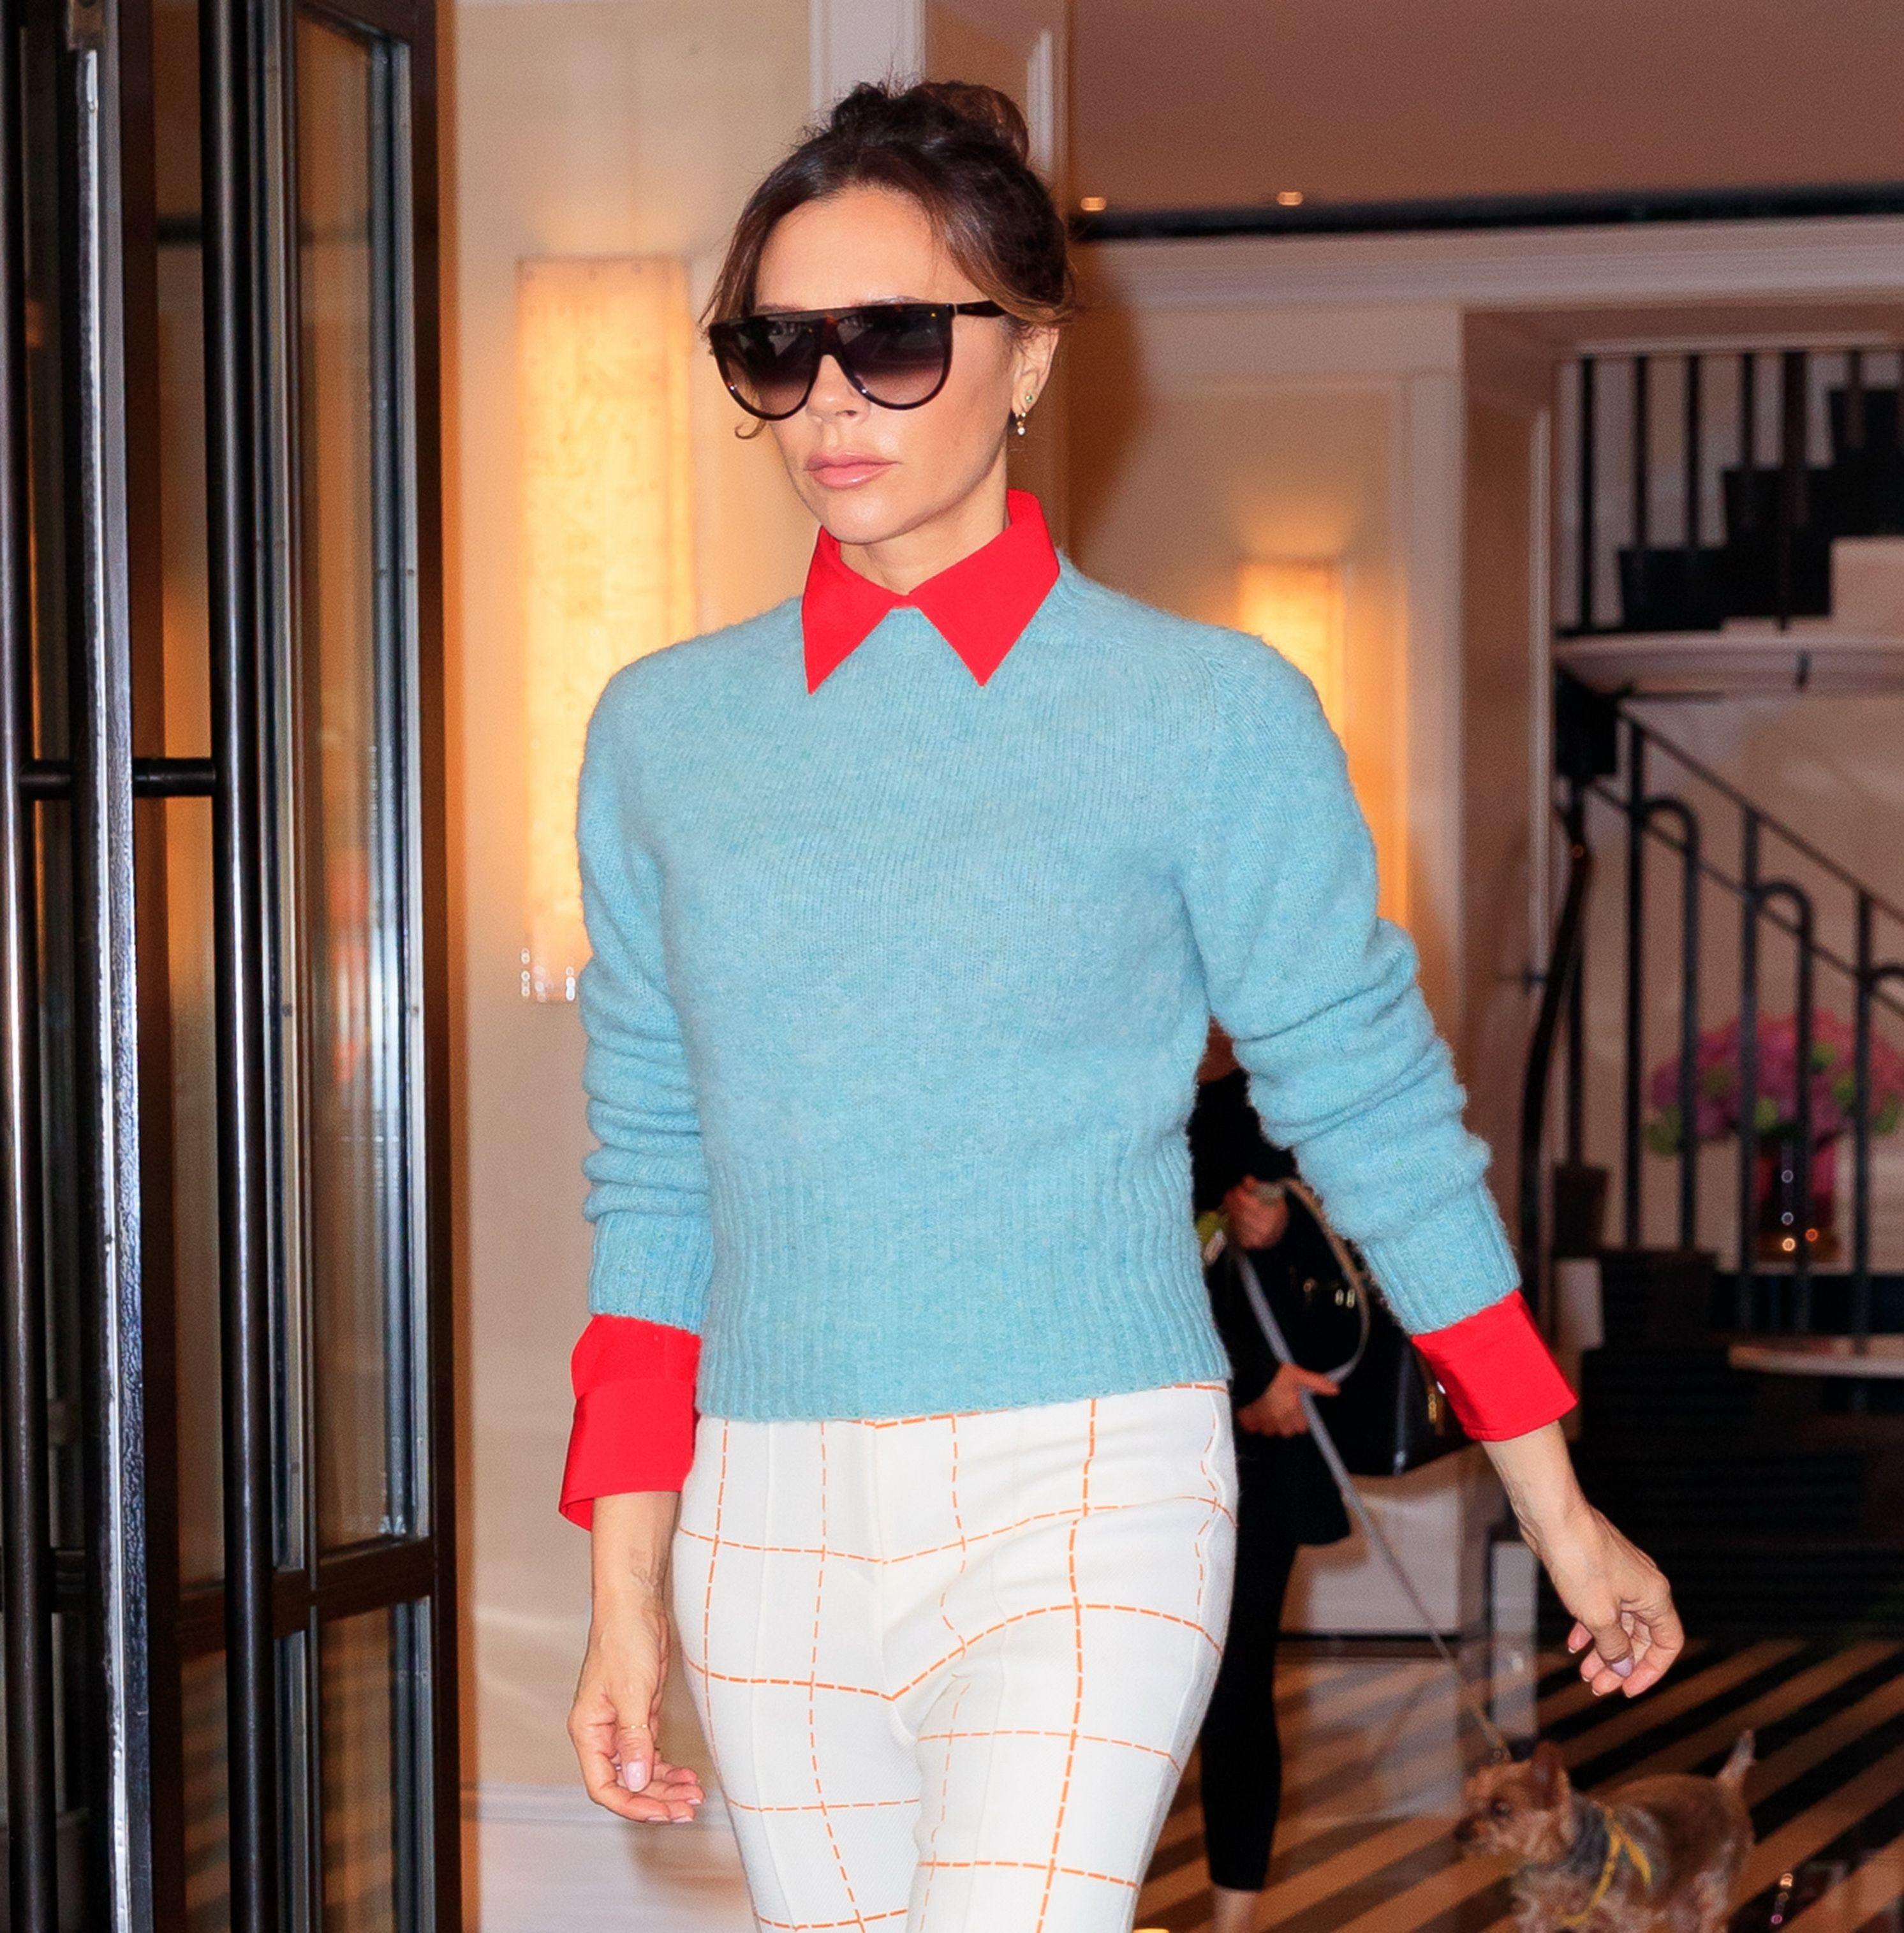 Victoria Beckham reveals Harper wears make-up - but only at home